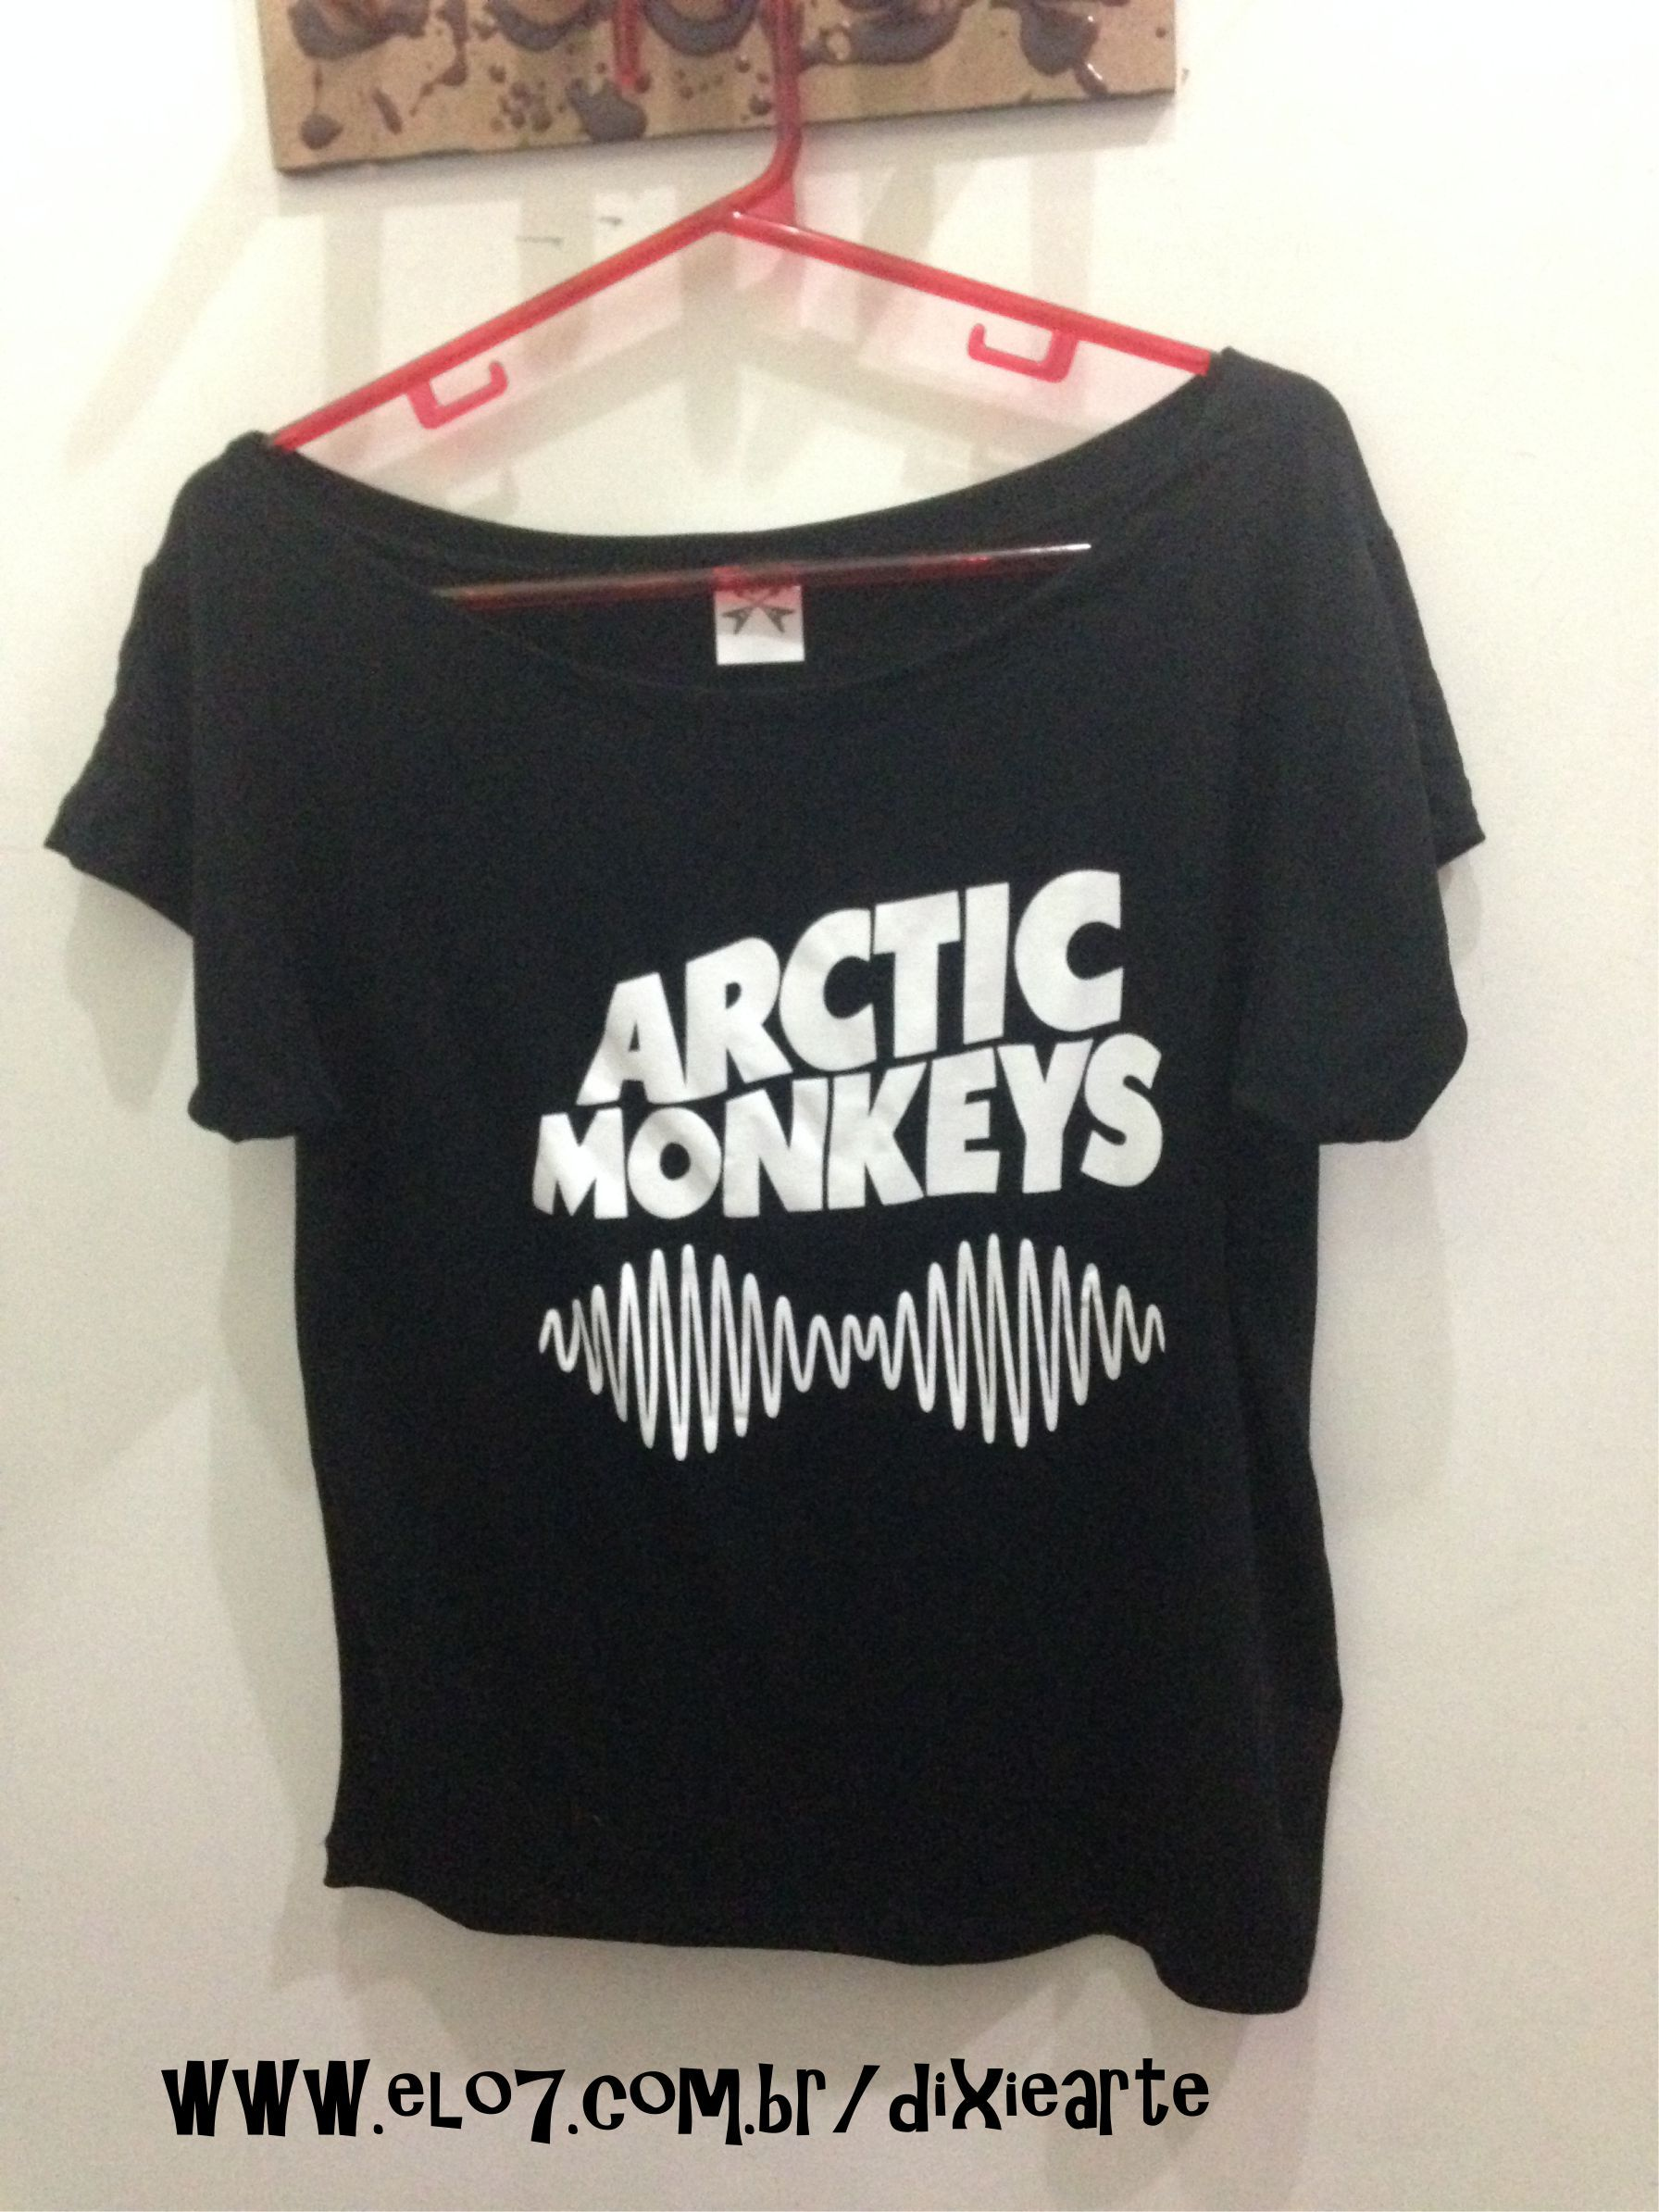 d5957f0964 Blusa Gola Canoa Arctic Monkey - www.elo7.com.br dixiearte